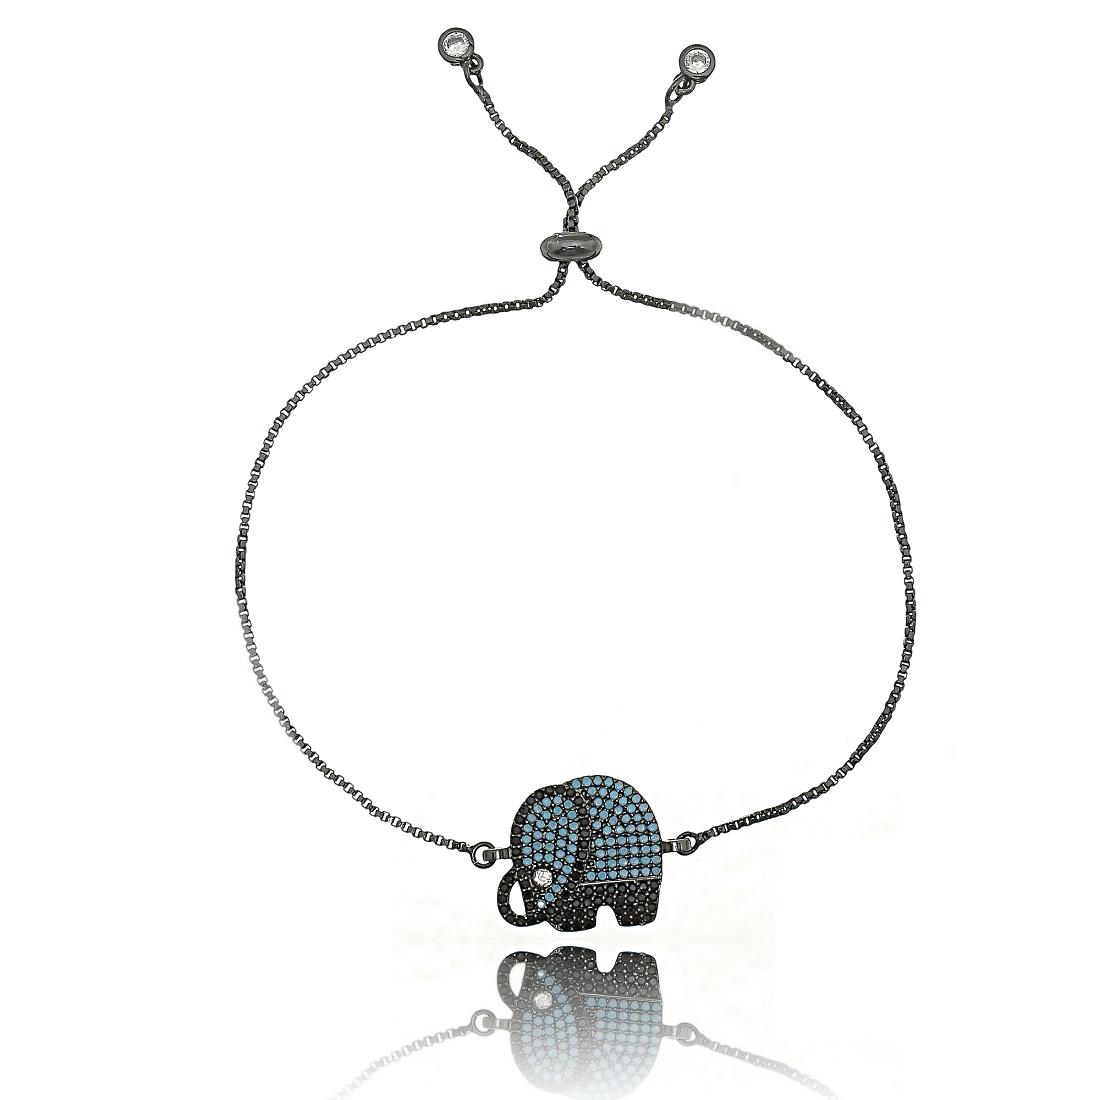 Pulseira de Elefante Ajustável Amuleto da Sorte Zircônia Turquesa Semijoia Ródio Negro  - Soloyou